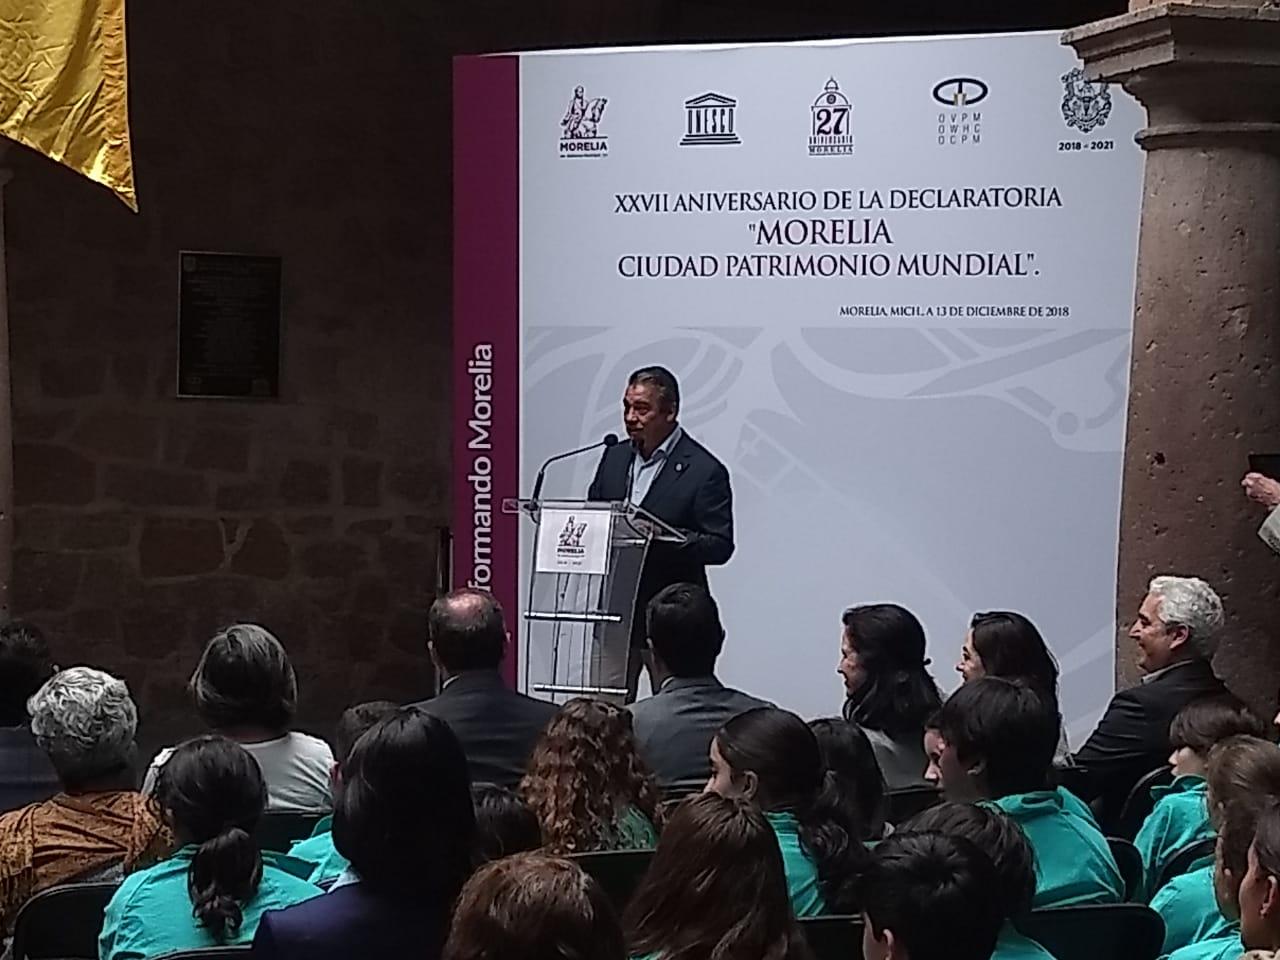 Pese a conflictos, Morelia celebra 27 años de ser patrimonio mundial